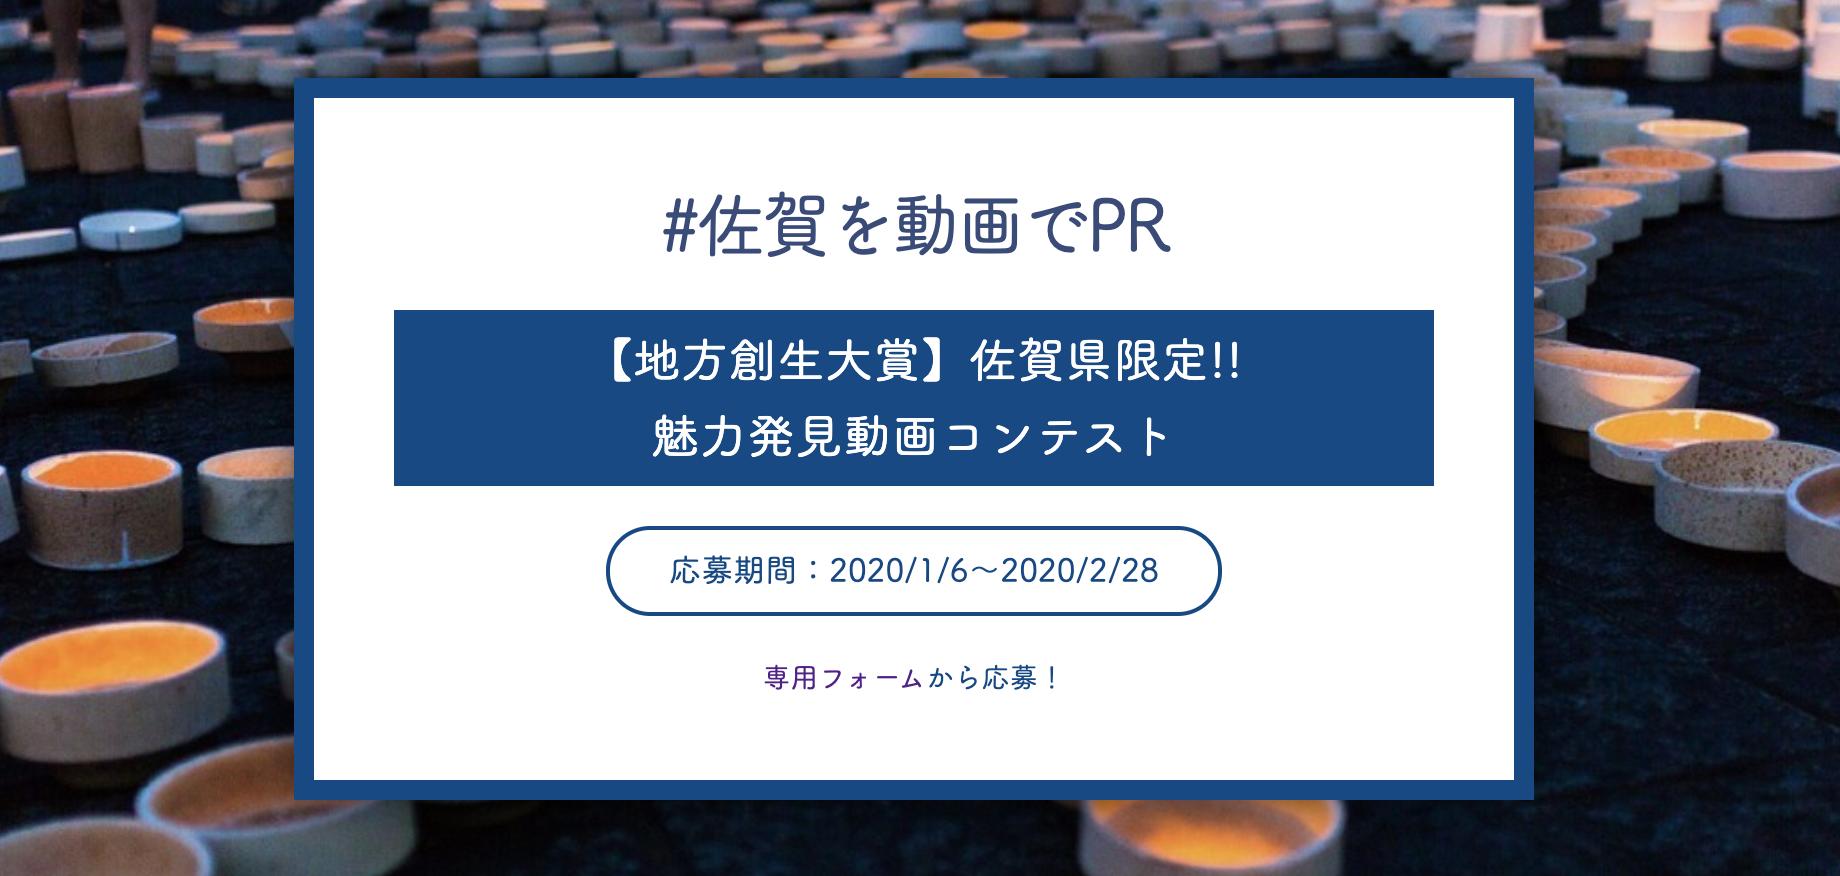 【地方創生大賞】佐賀県限定!!魅力発見動画コンテスト表彰式